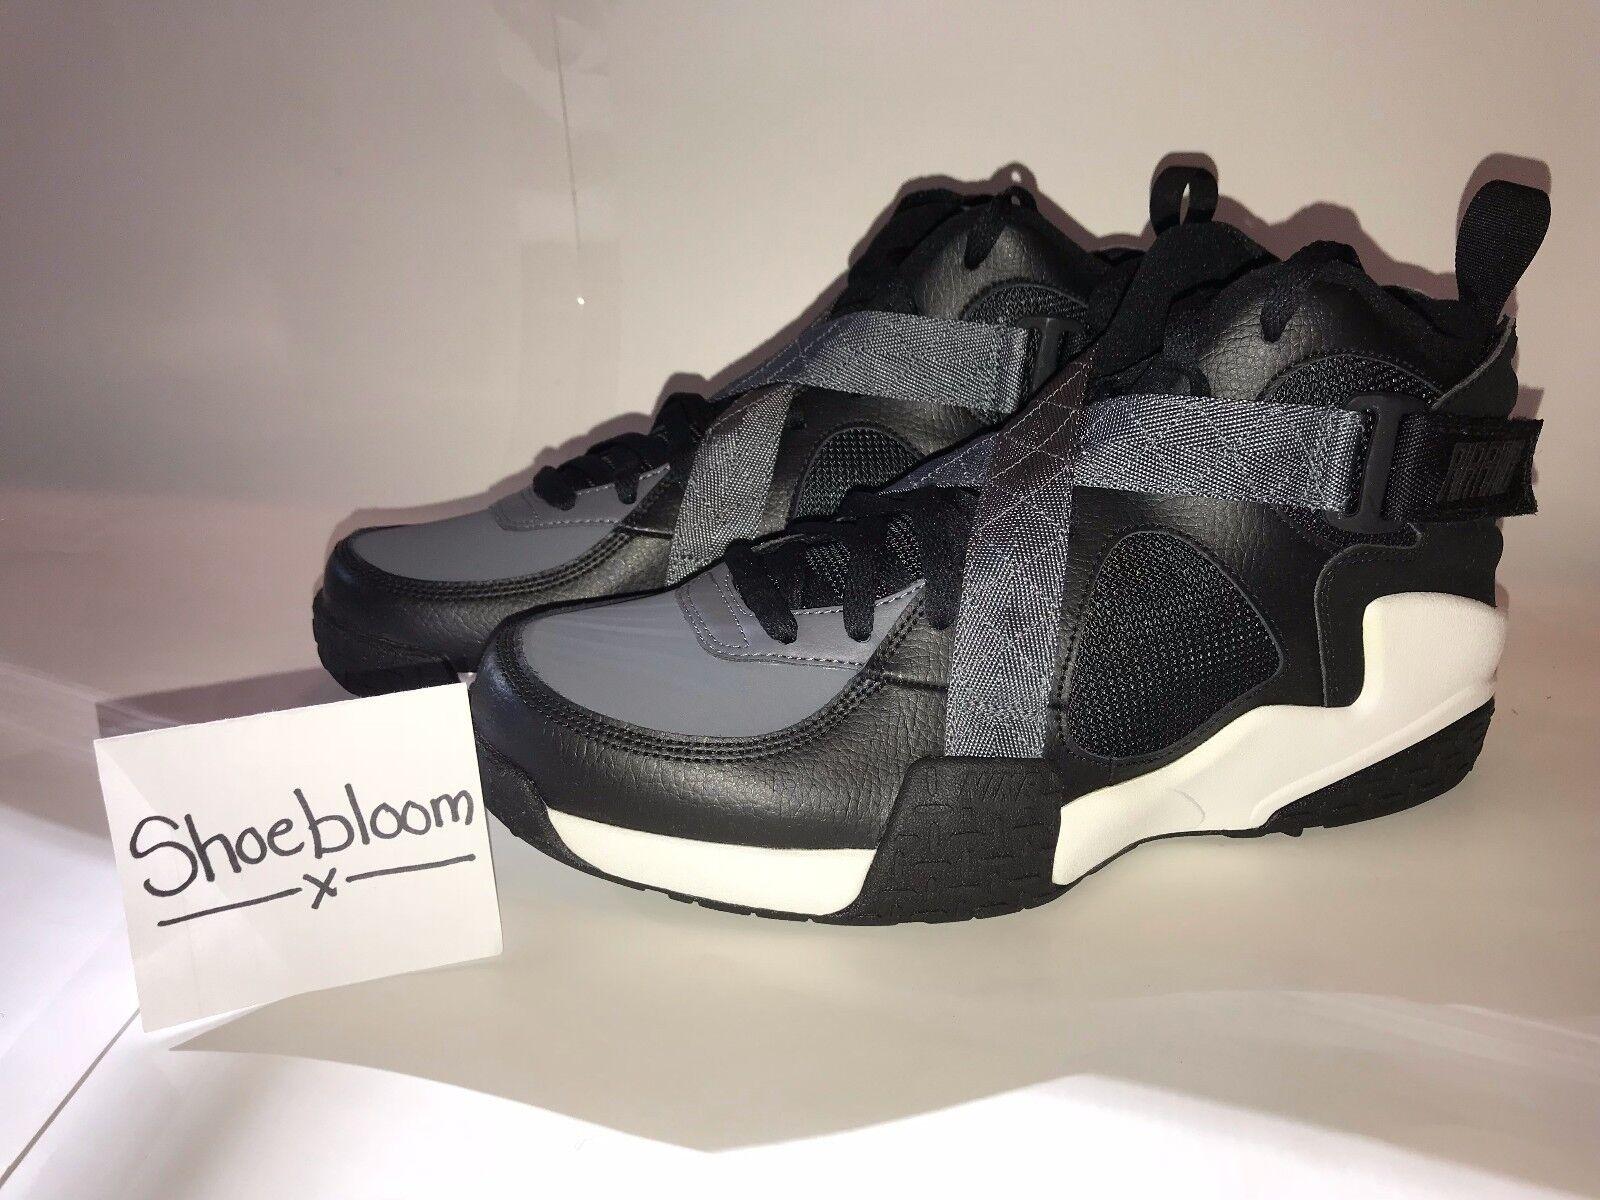 Nike Air Raid Outdoor Jordan 8 Raiders Bo Knows PE Size 11.5 100% Authentic BNIB